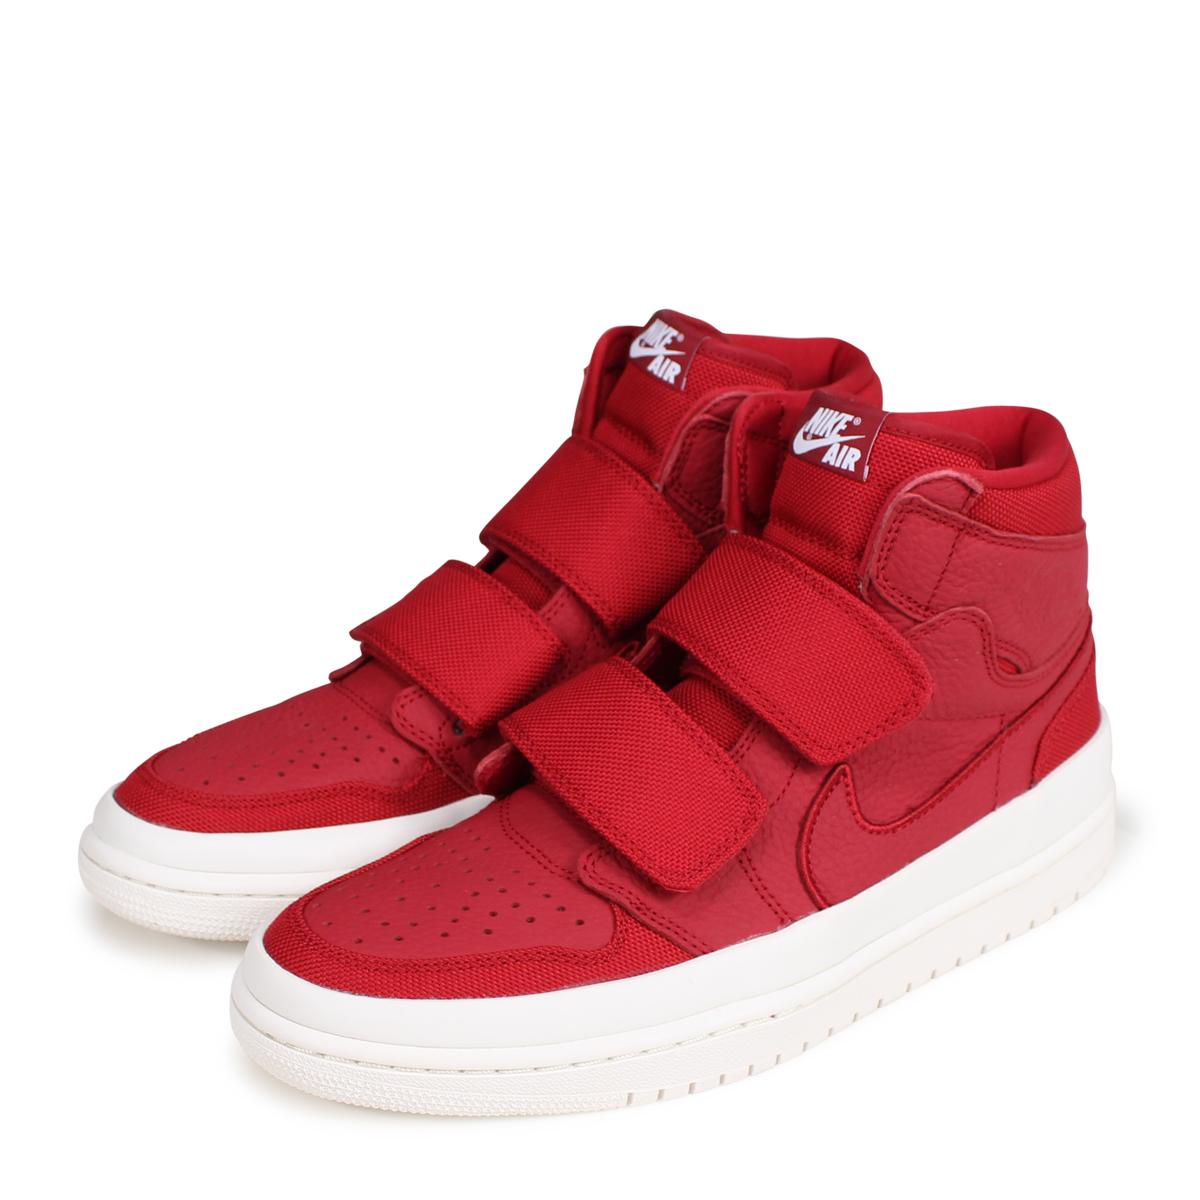 ALLSPORTS  NIKE AIR JORDAN 1 RETRO HI DOUBLE STRAP Nike Air Jordan 1 ... e24e8a2b1